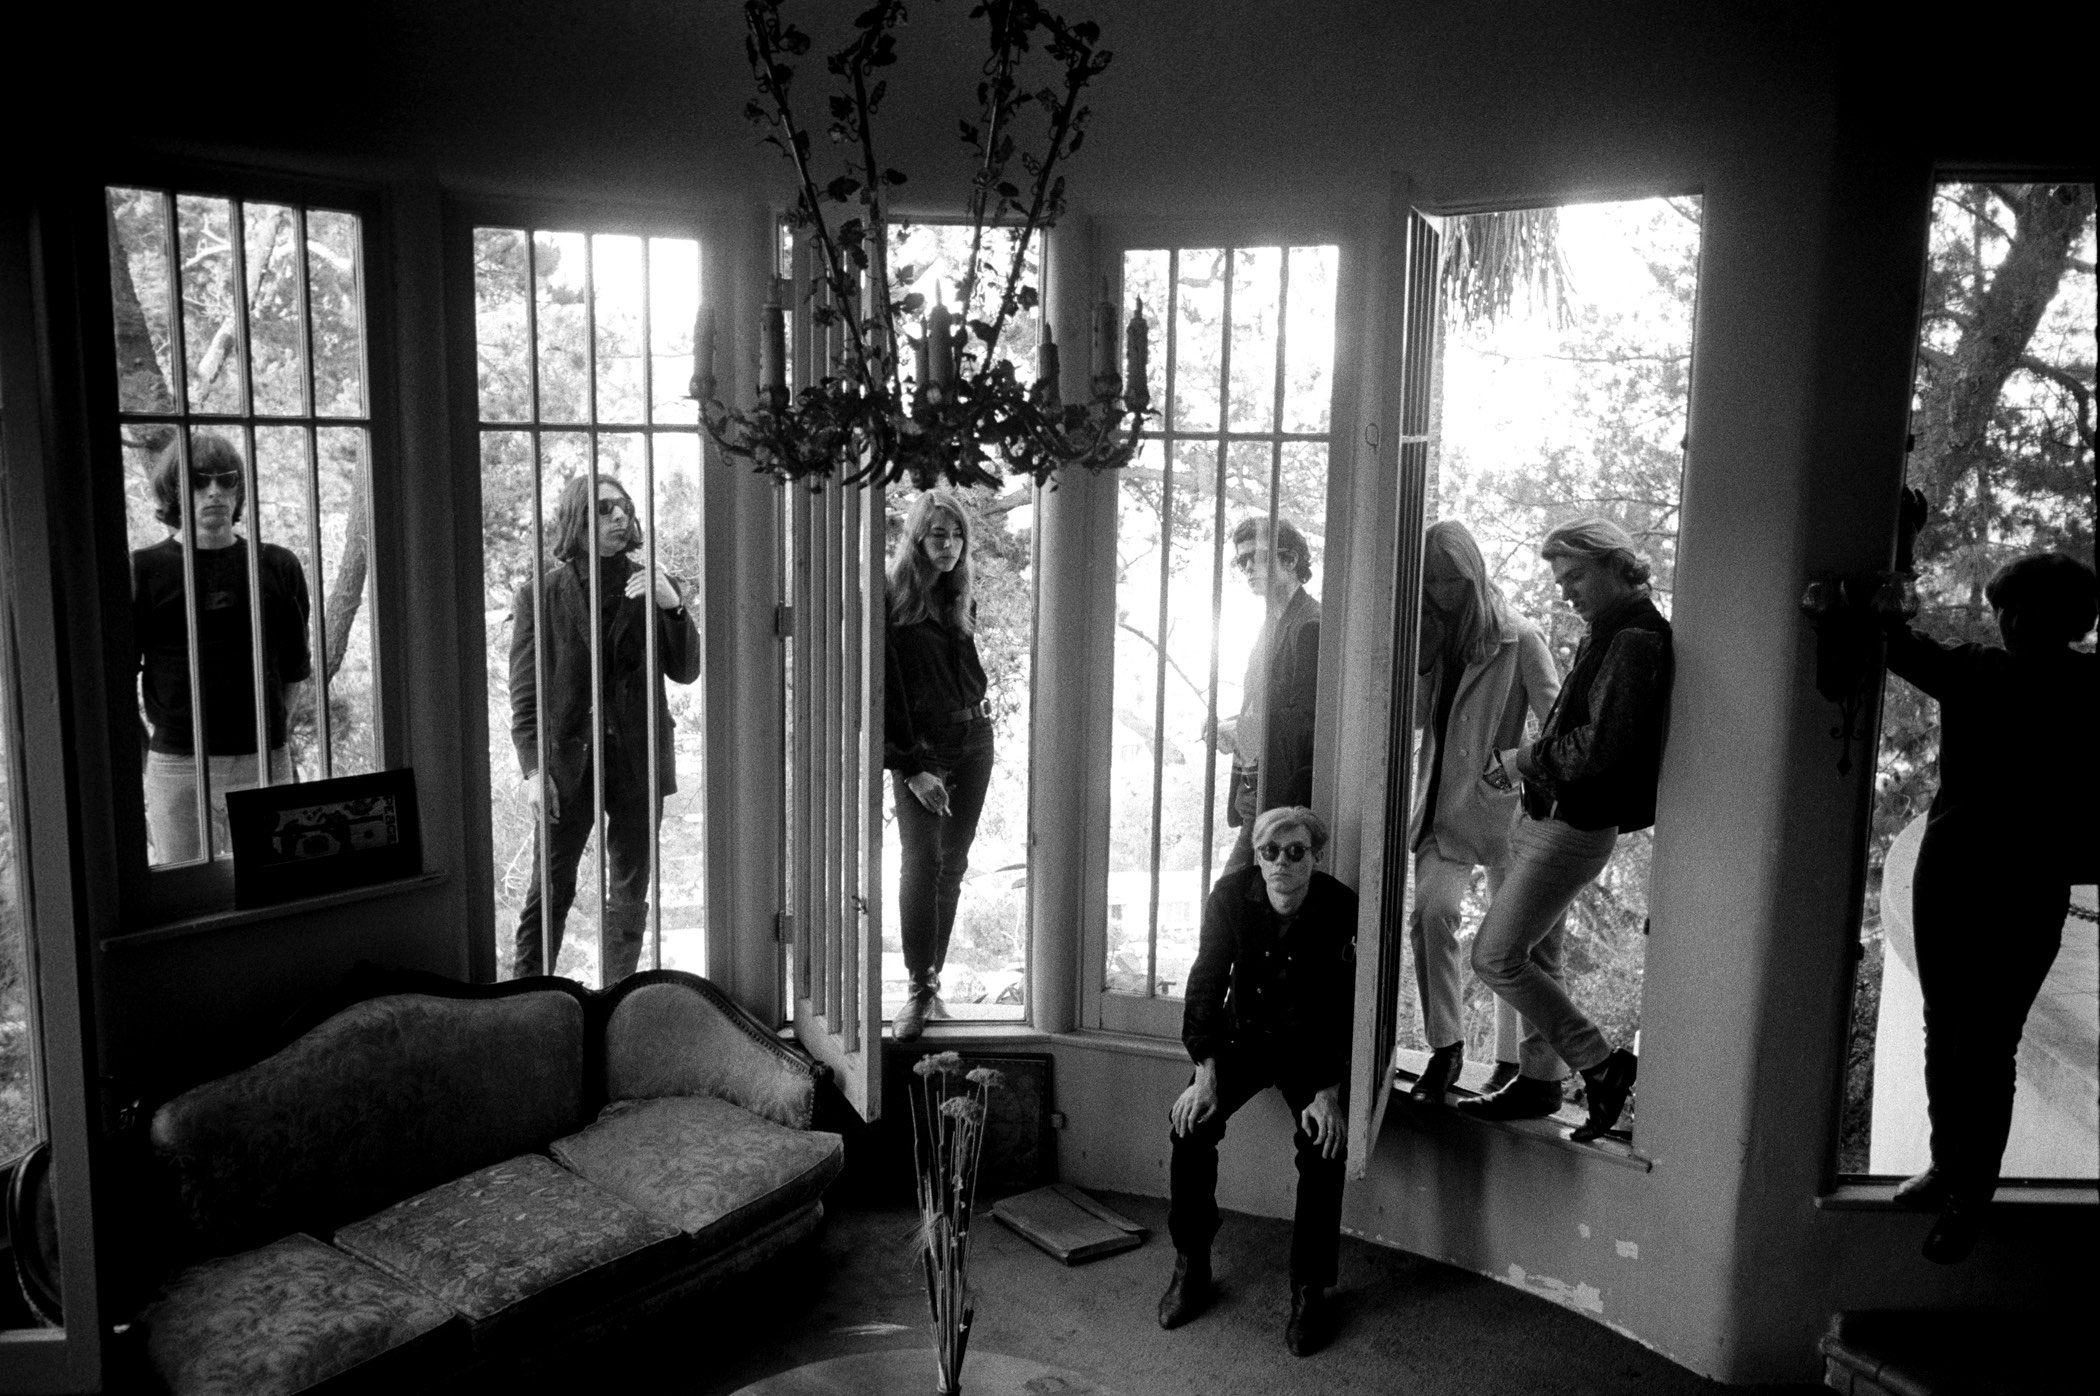 Warhol and the Velvet Underground through window. Los Angeles © Steve Schapiro